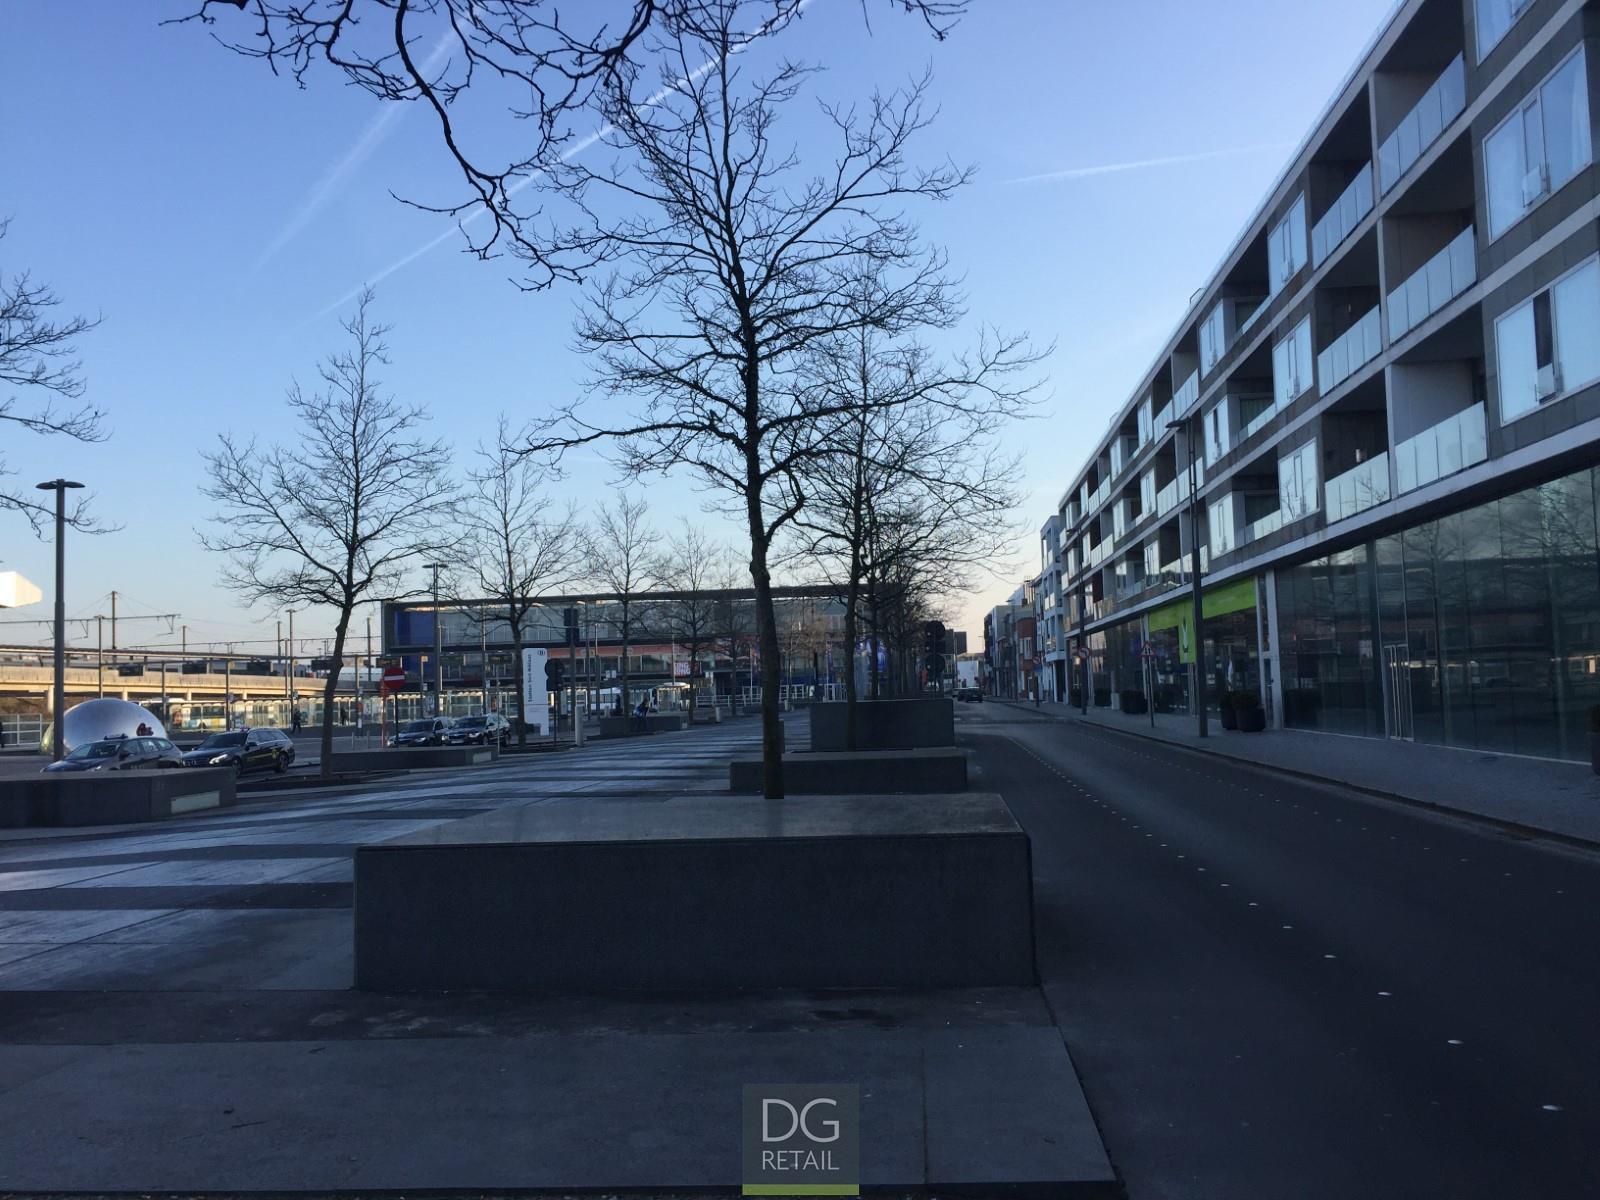 commercieel gelijkvloers te koop 'Plaza Express' (R1131)  - Stationsplein  , 9100 Sint-Niklaas, België 4